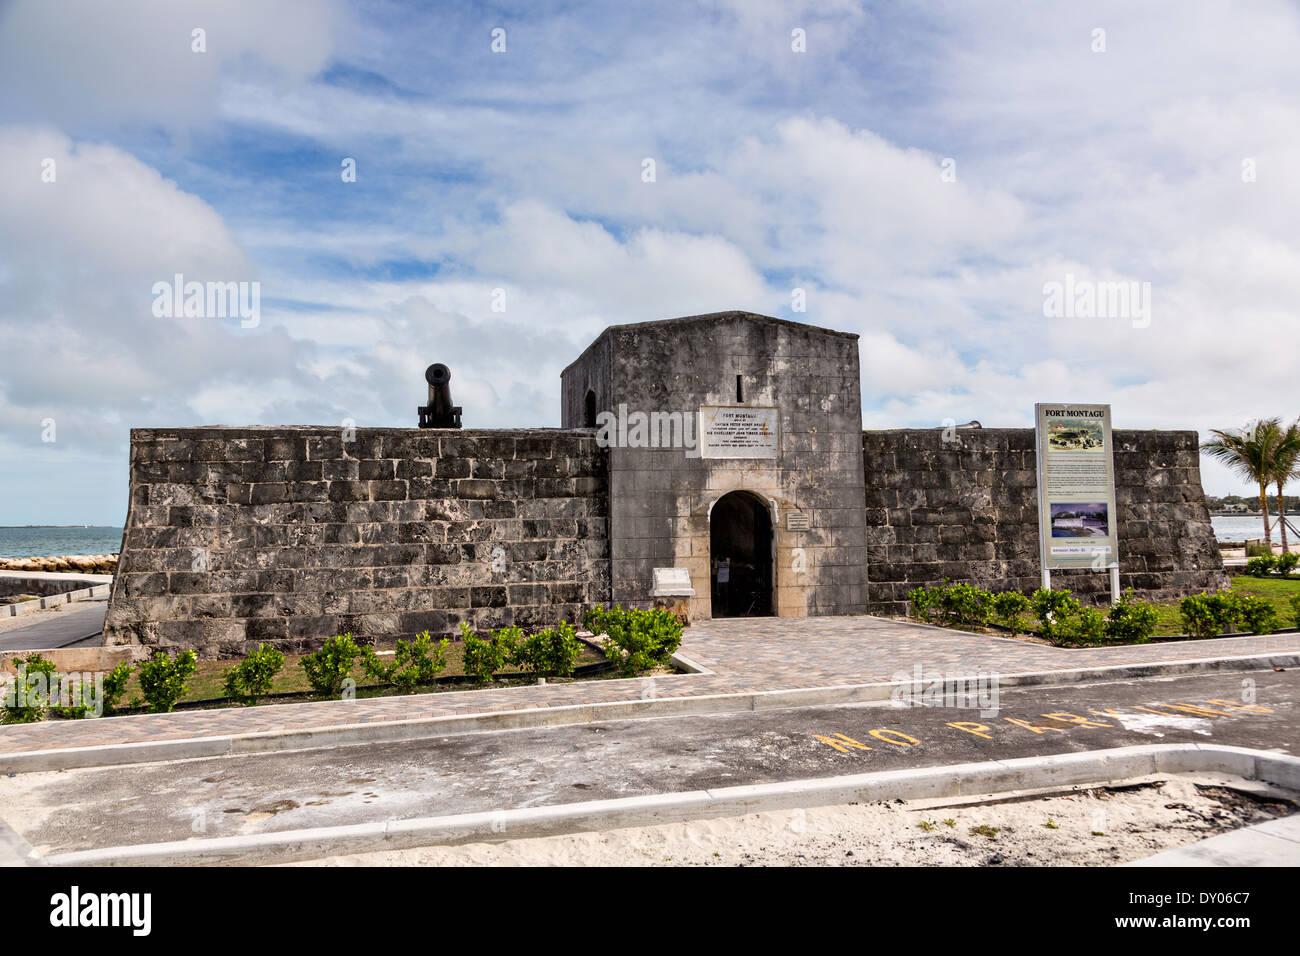 Fort Montagu Nassau, Bahamas. - Stock Image